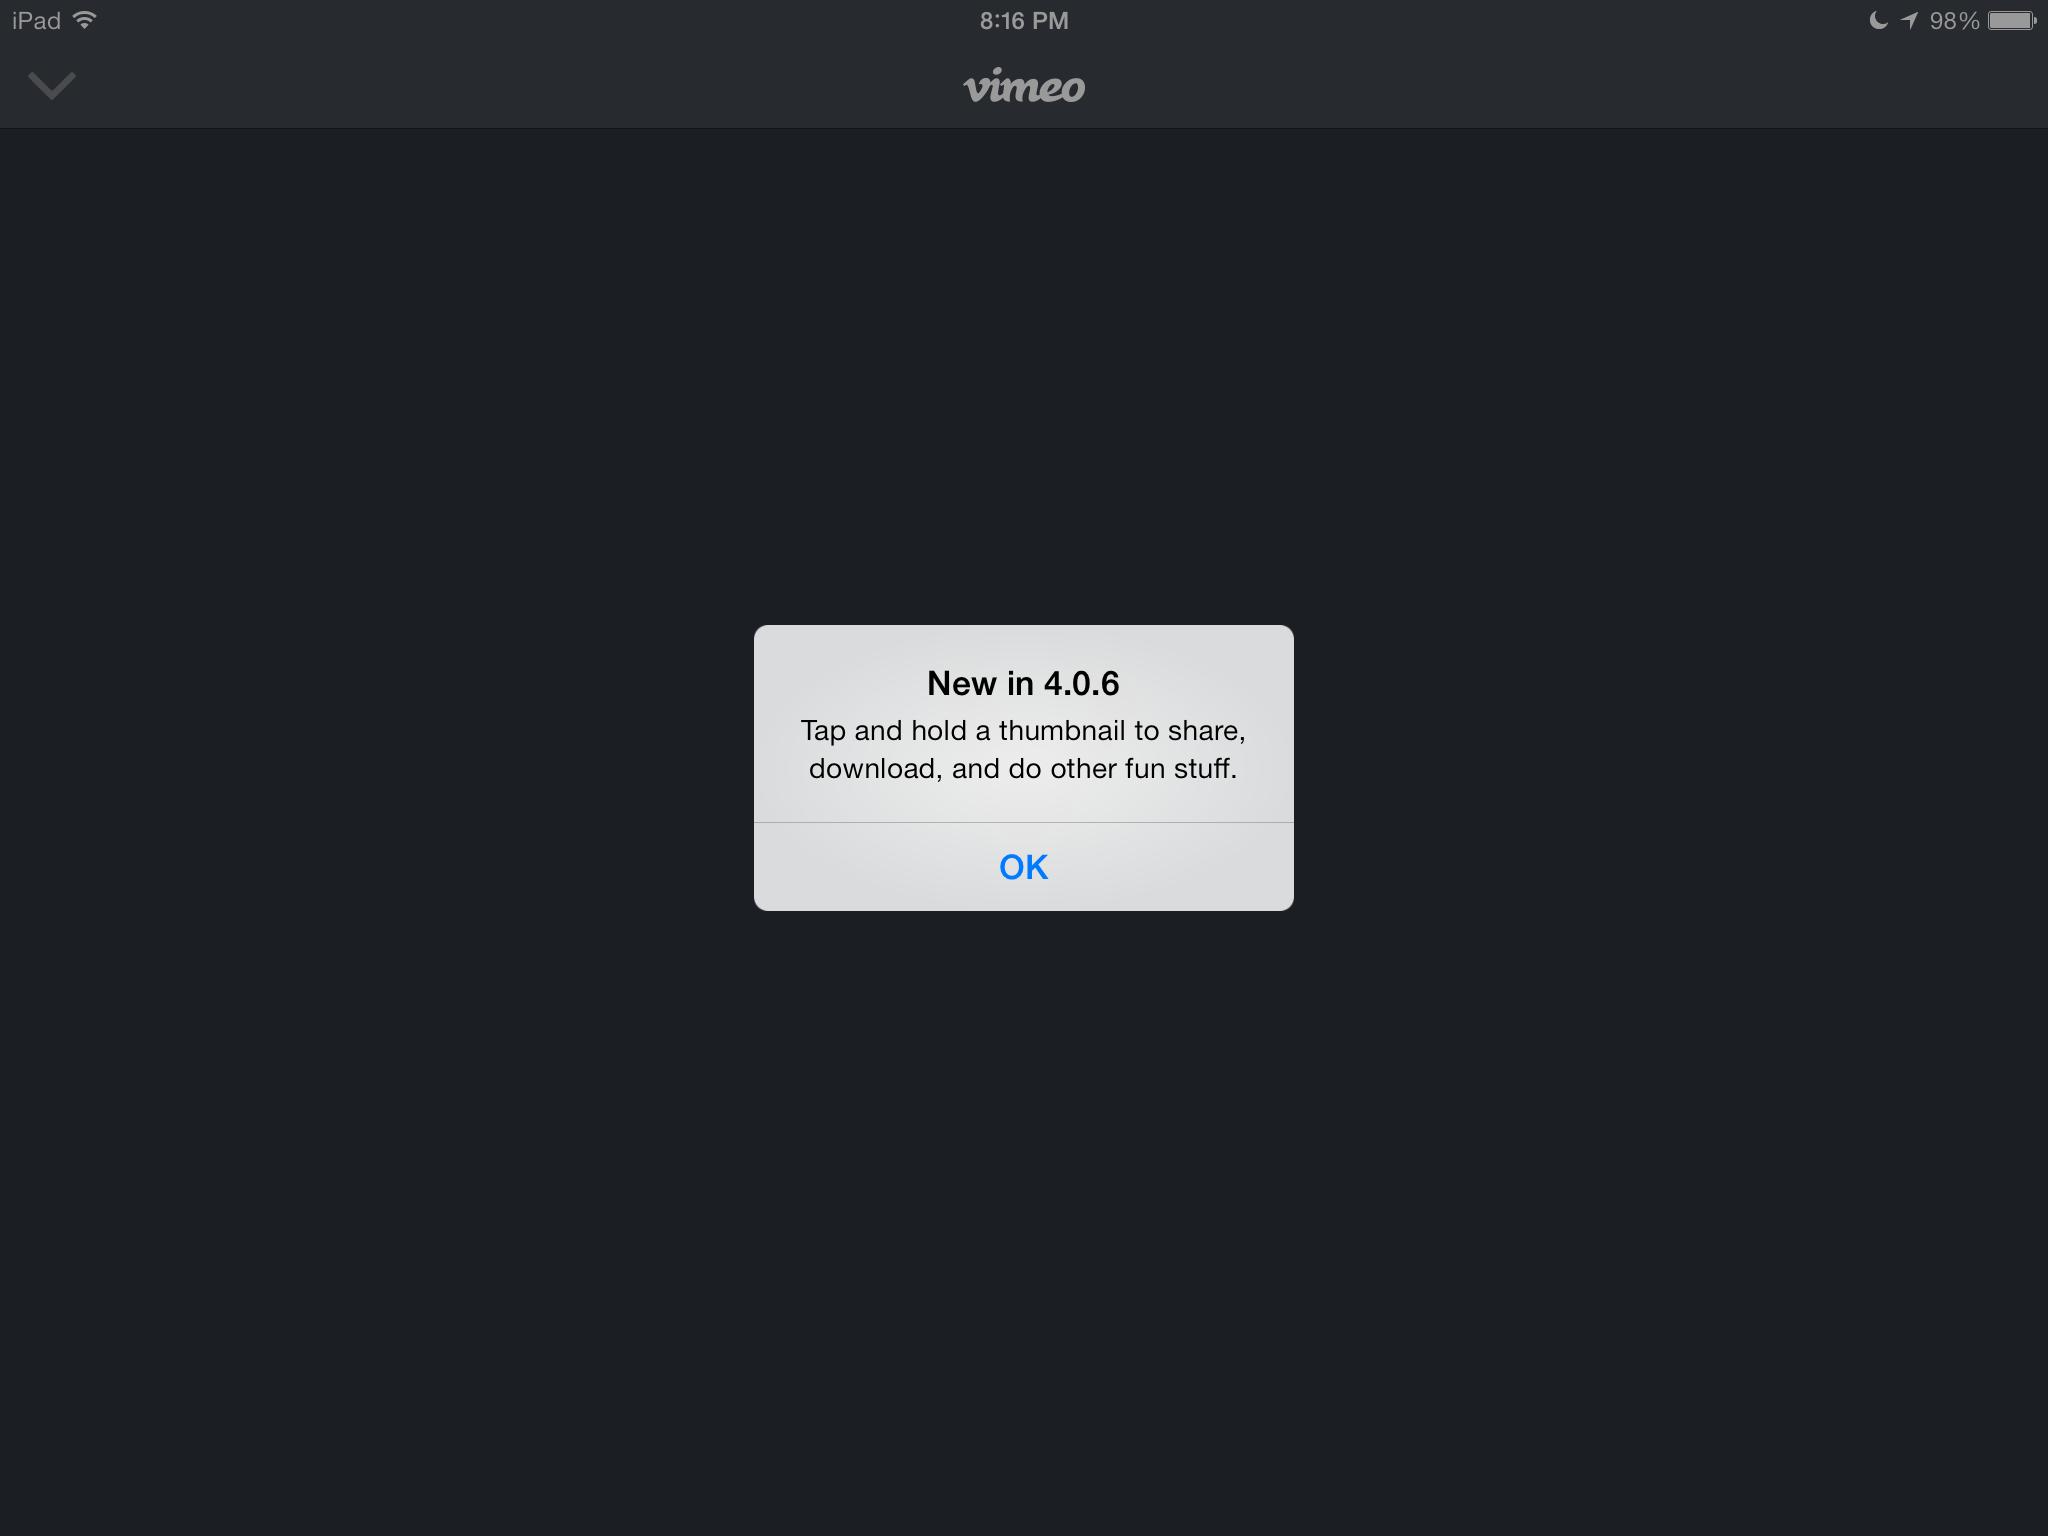 Vimeo 4.0.6 for iOS (iPad screenshot 002)